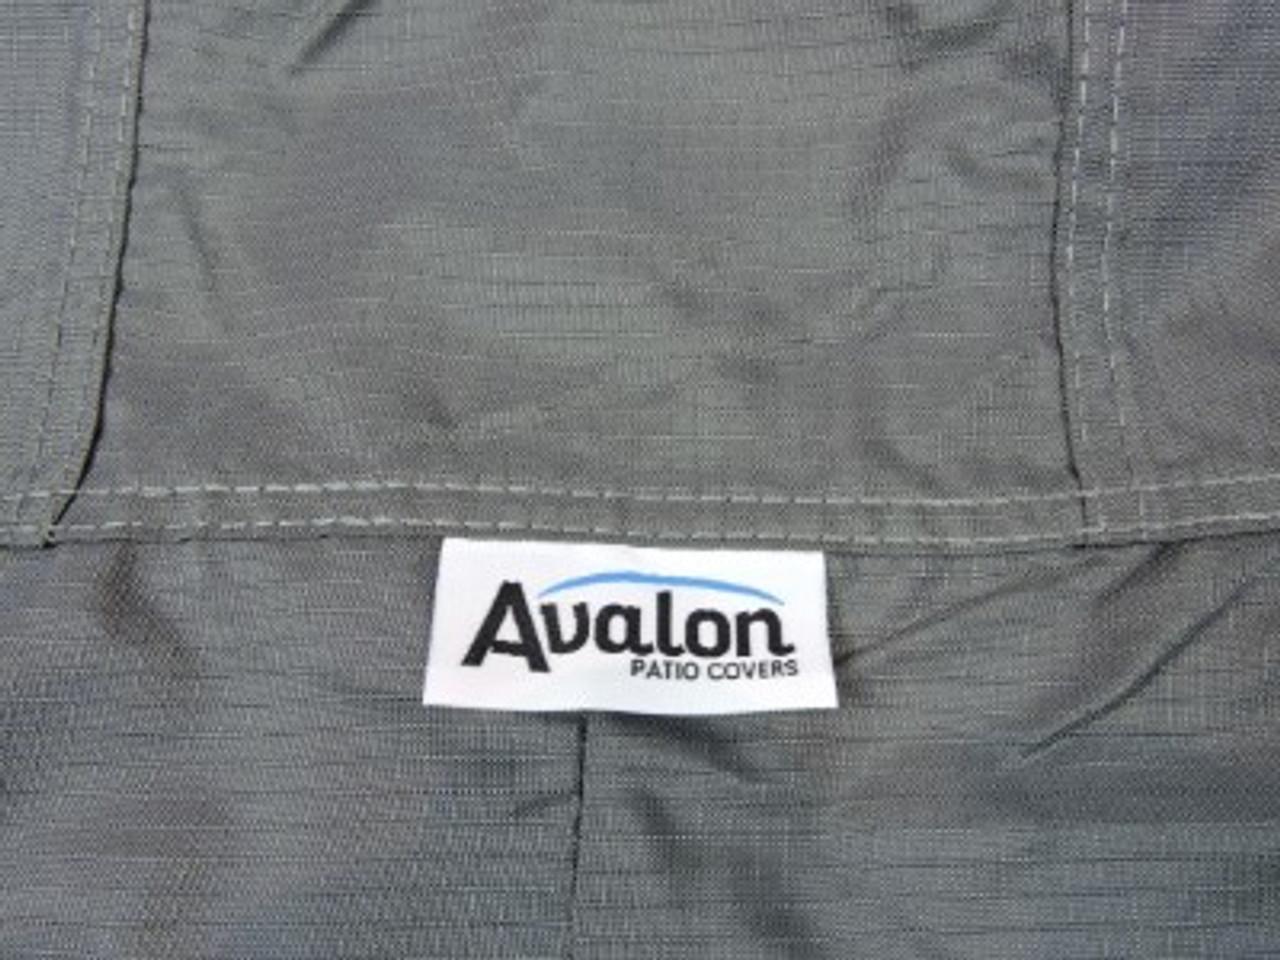 Round Day Bed (79Wx22Hx36H) (Avalon #51550)